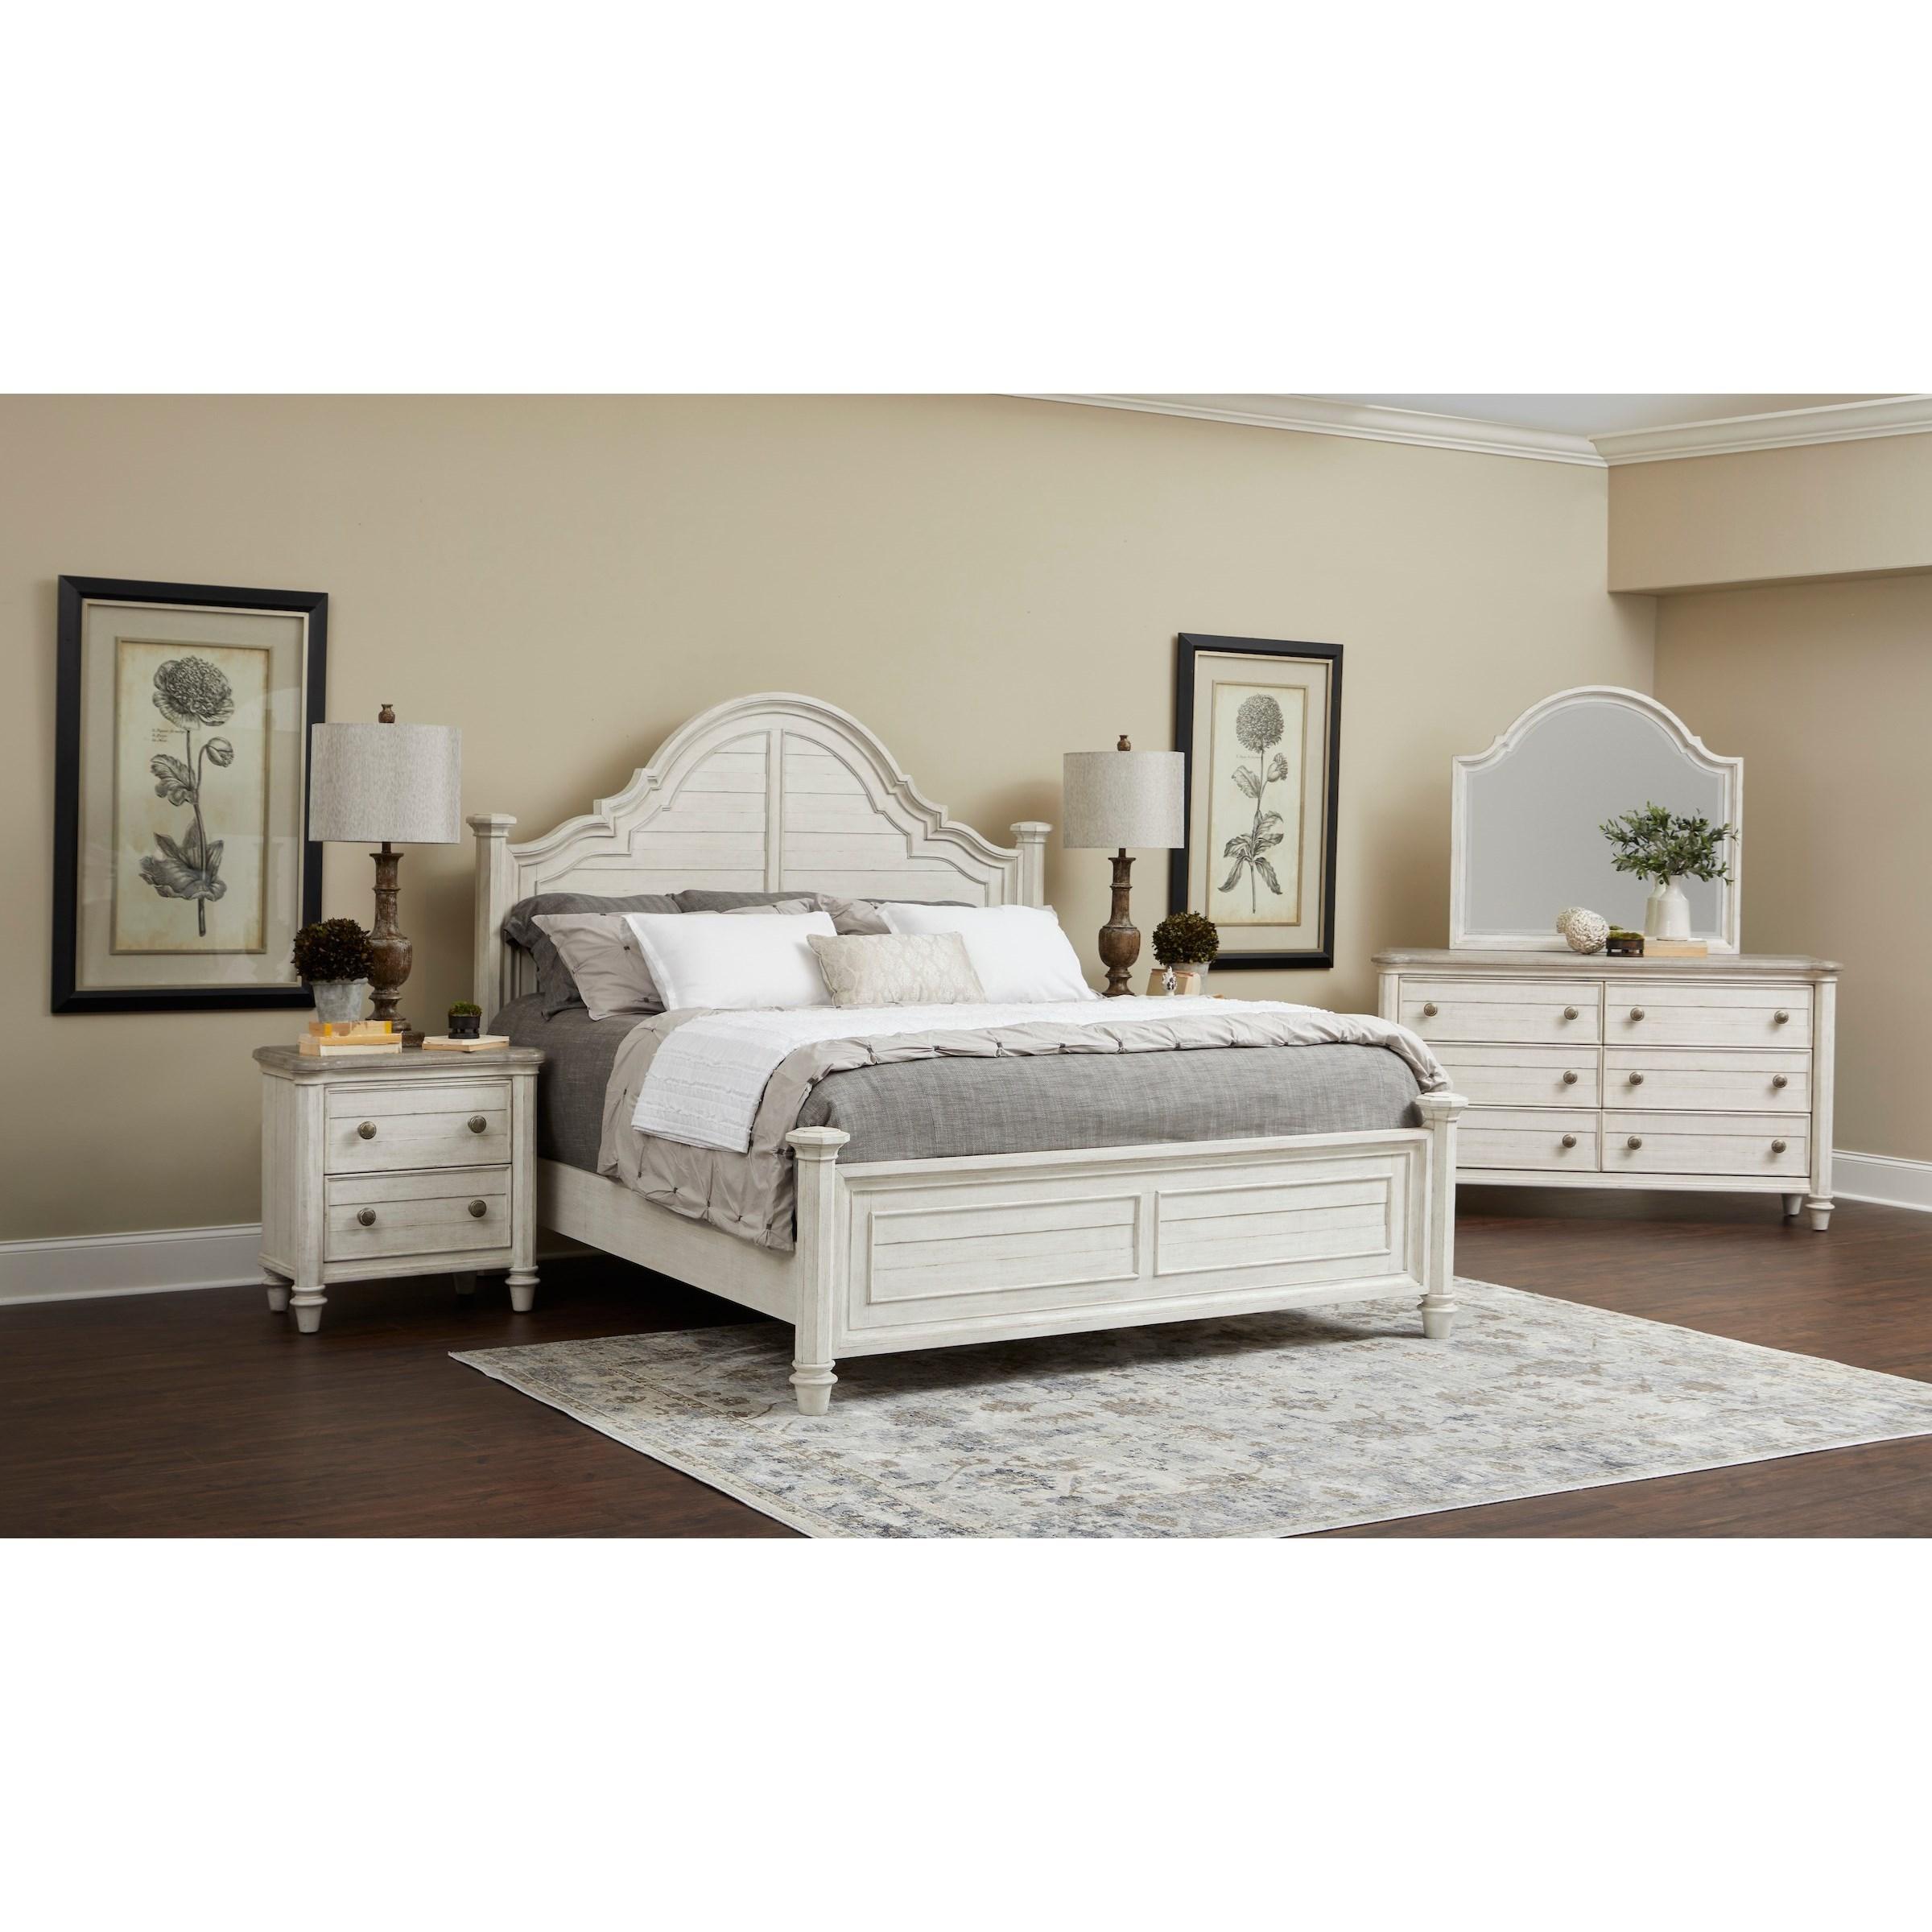 Maribelle Queen Bedroom Group by Klaussner International at Northeast Factory Direct